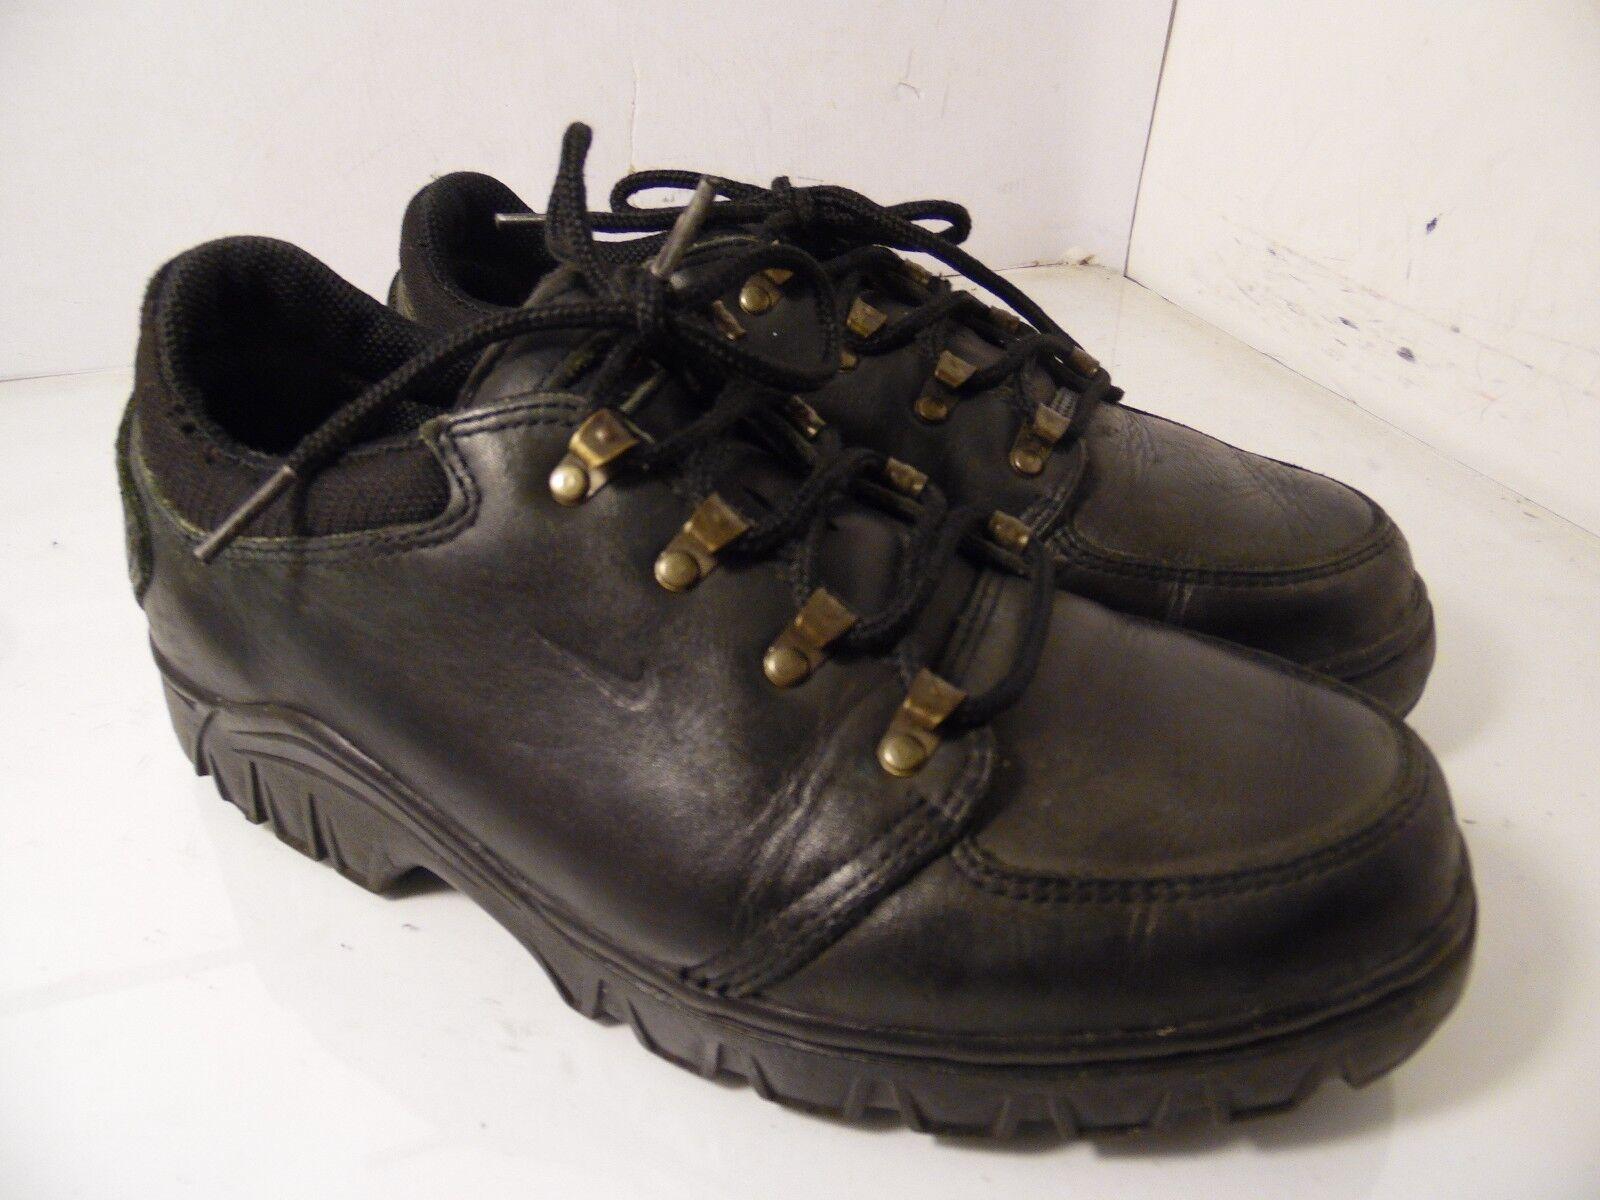 Nike Nike Nike acg di pelle nera, scarpe da trekking trekking scarpe mens 6,5 | Prezzo giusto  a403ea